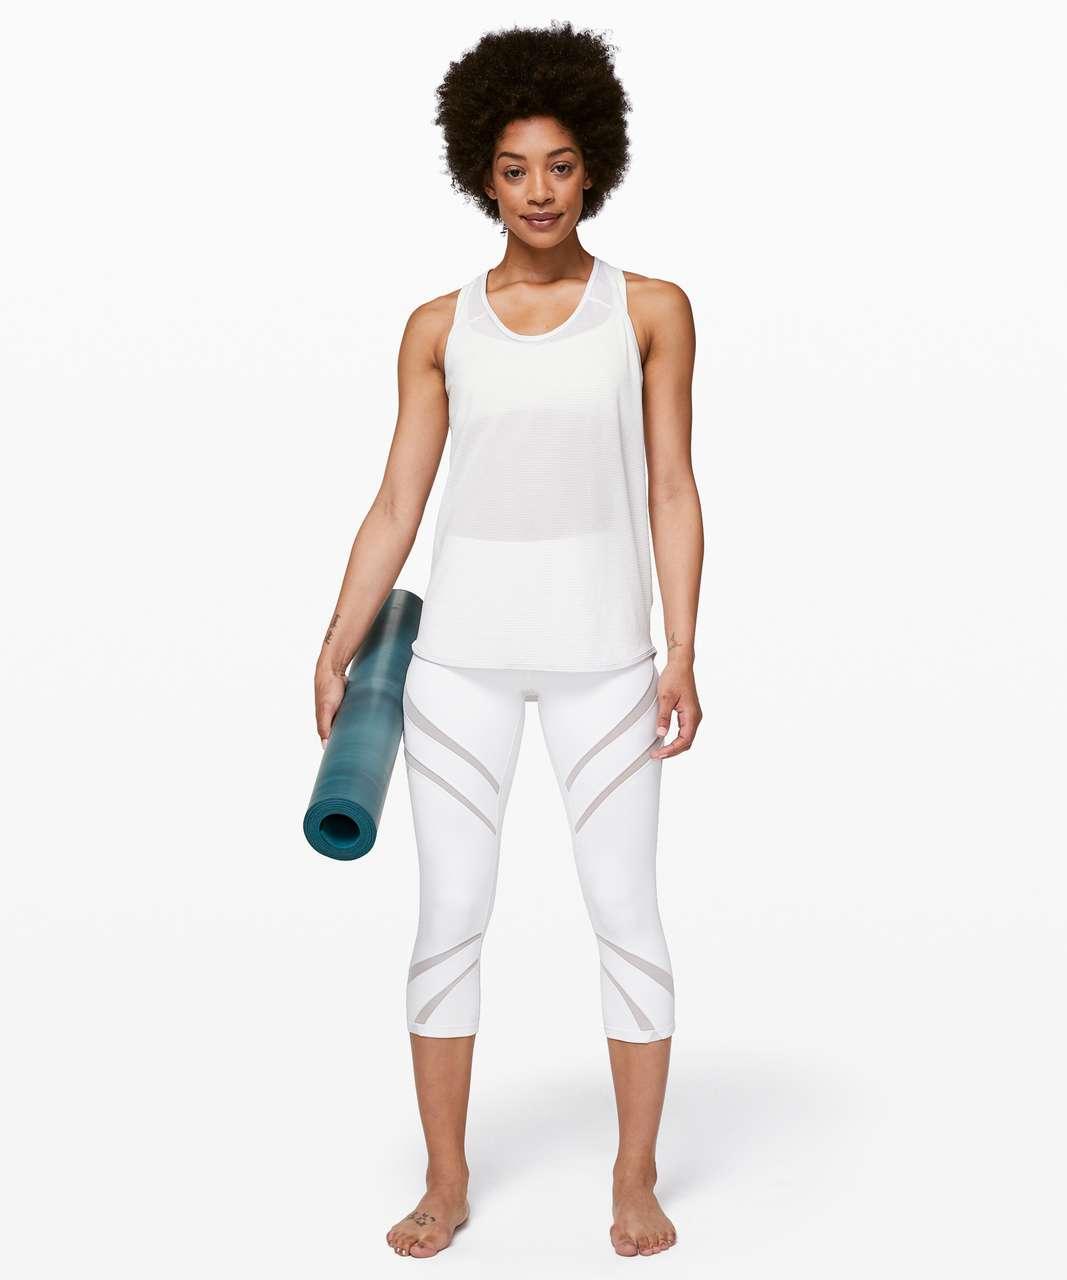 Lululemon Essential Tank *Scallop Texture - Heathered White